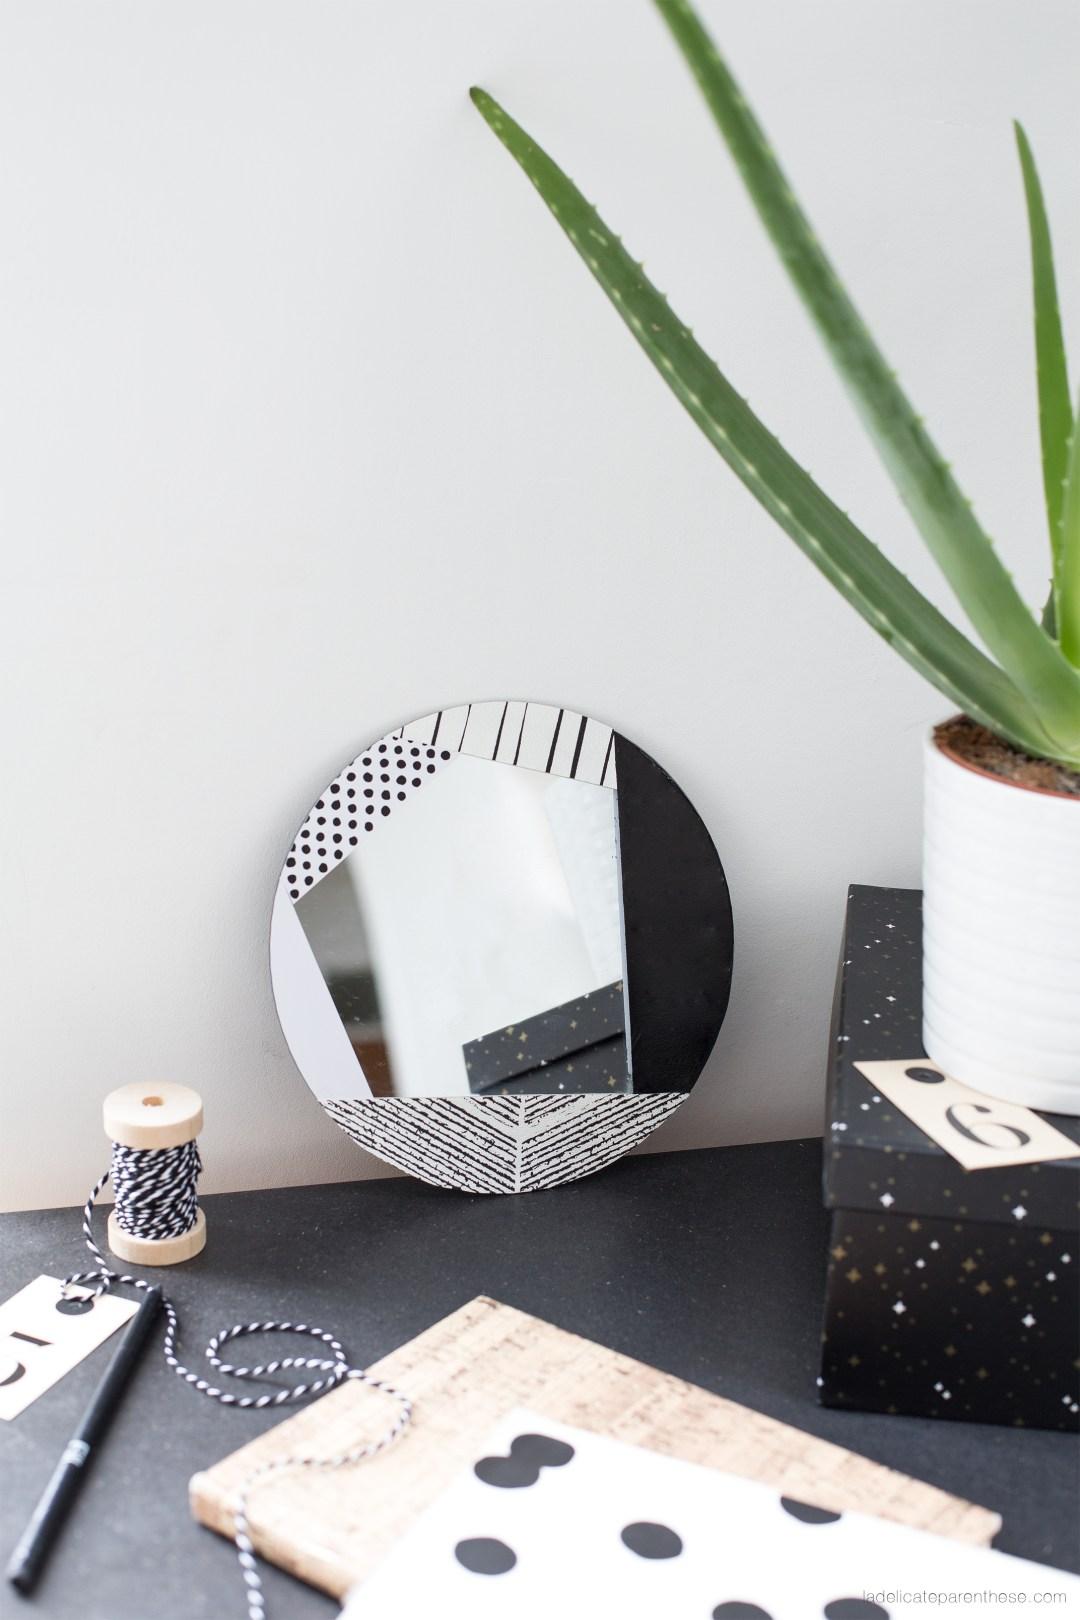 Handmade création DIY personnaliser son miroir avec du papier peint